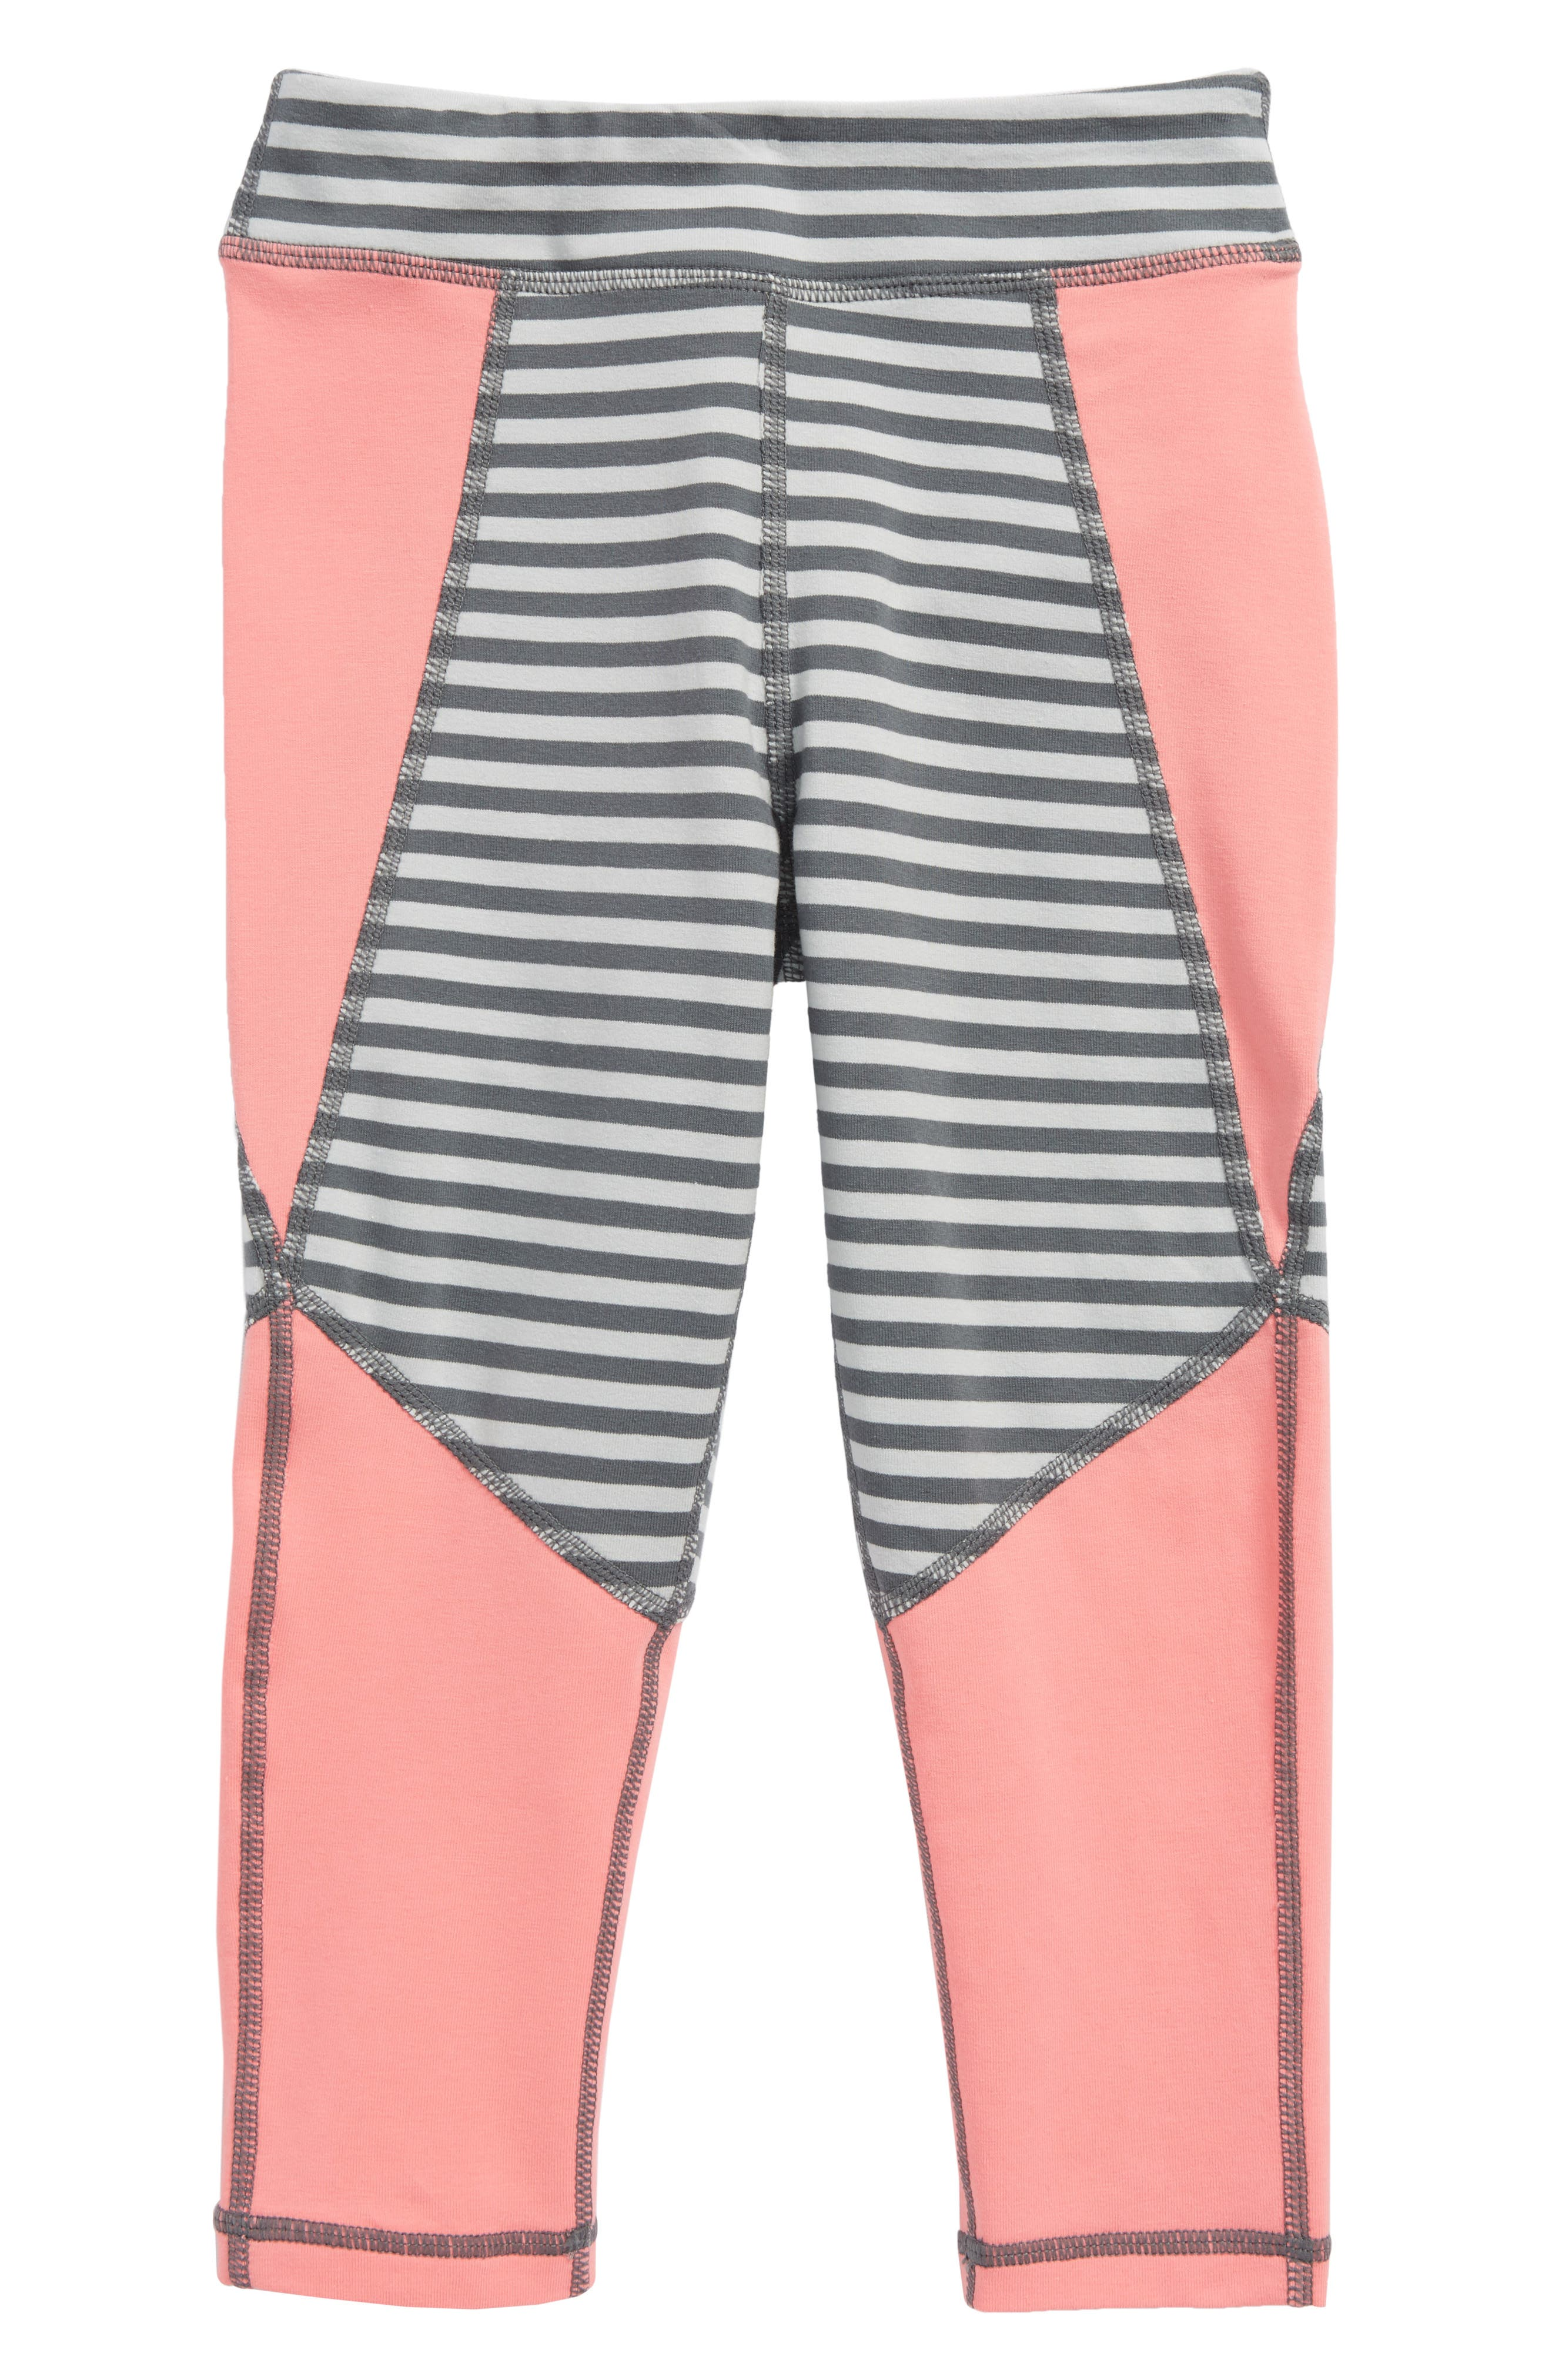 Alternate Image 1 Selected - Tea Collection Active Colorblock Crop Leggings (Toddler Girls, Little Girls & Big Girls)